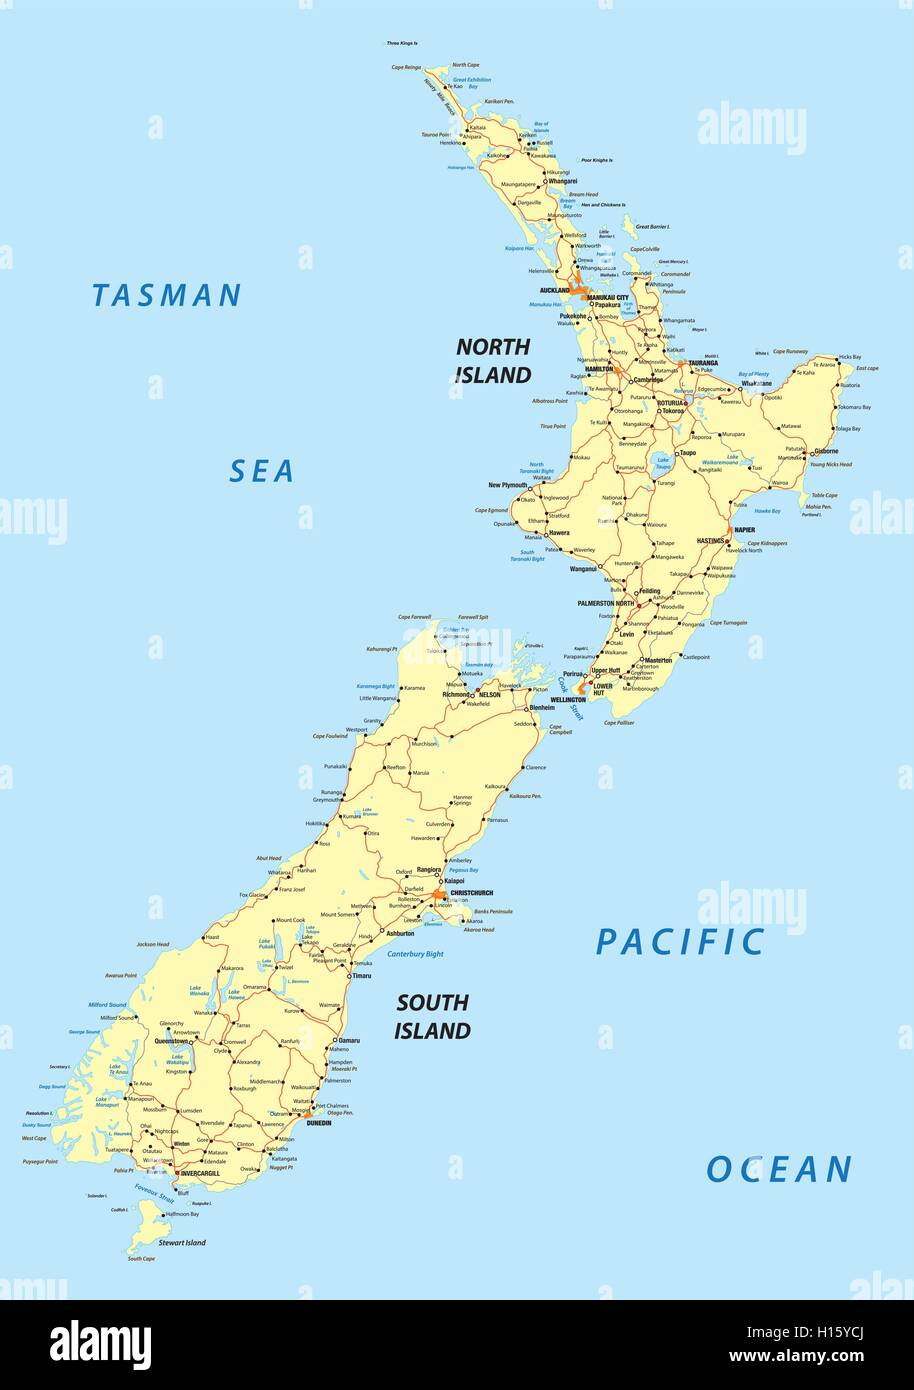 New Zealand Road Map.New Zealand Road Map Stock Vector Art Illustration Vector Image